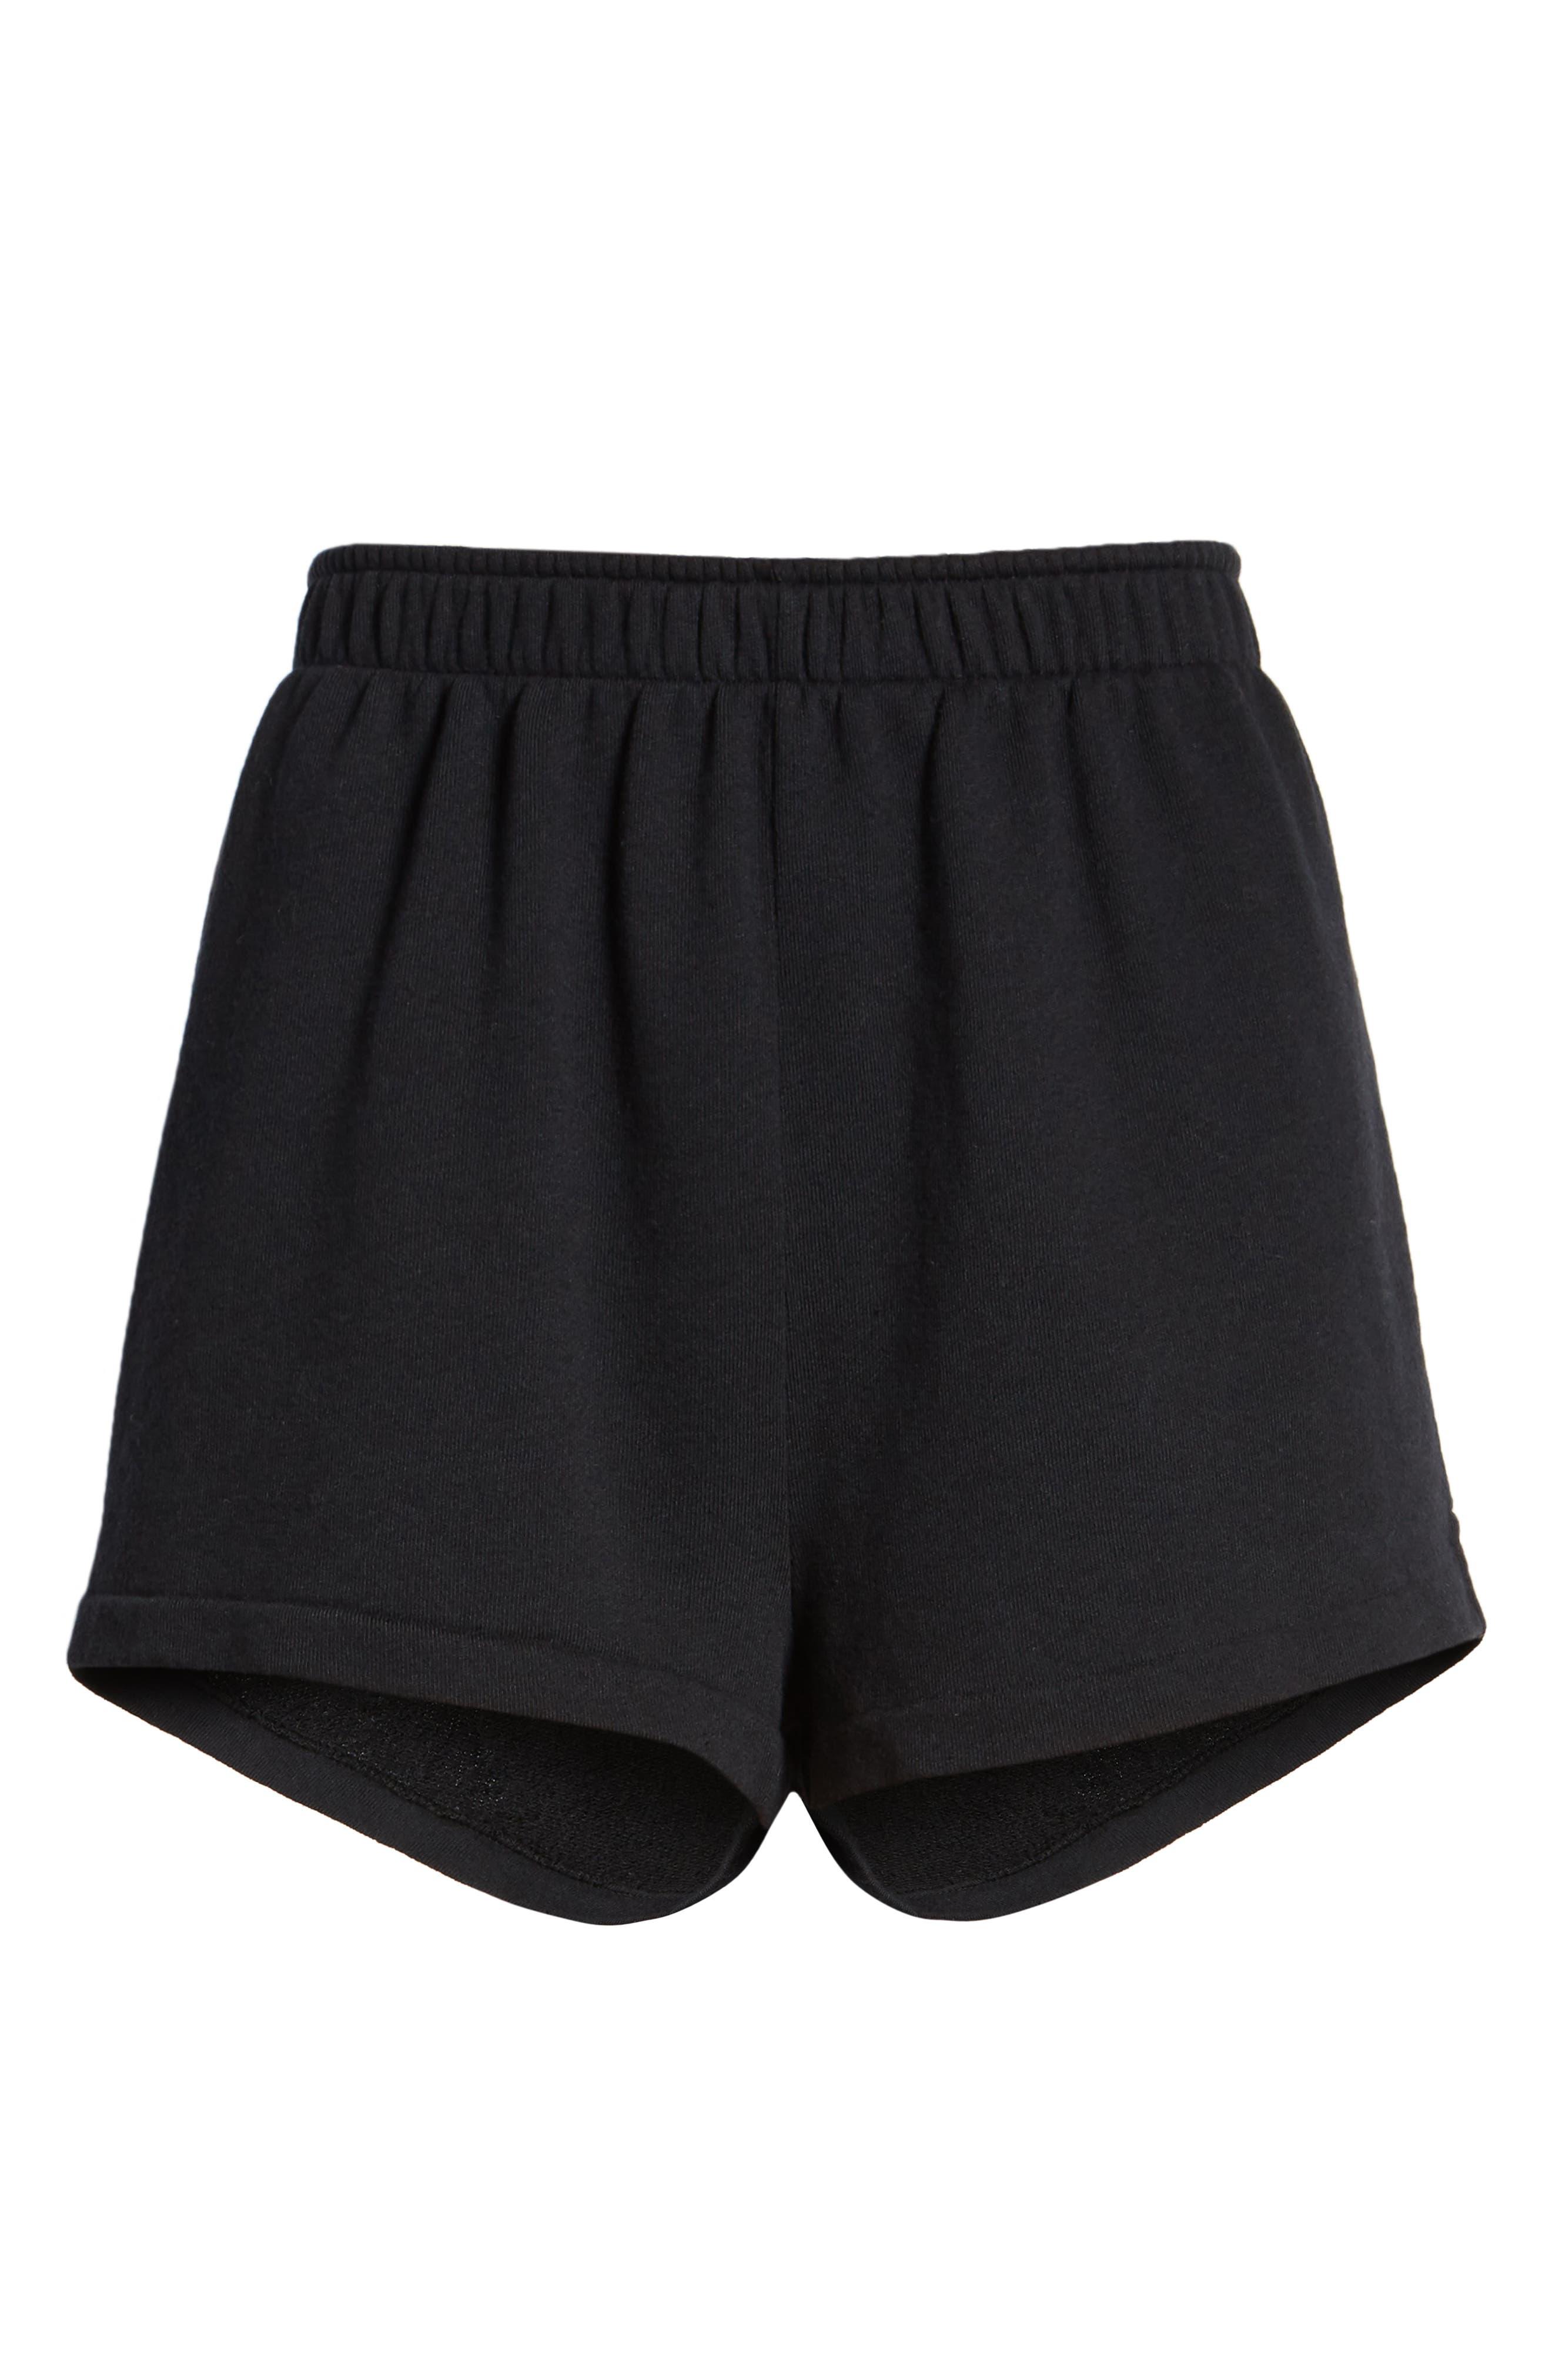 Golden Shorts,                             Alternate thumbnail 6, color,                             JET BLACK